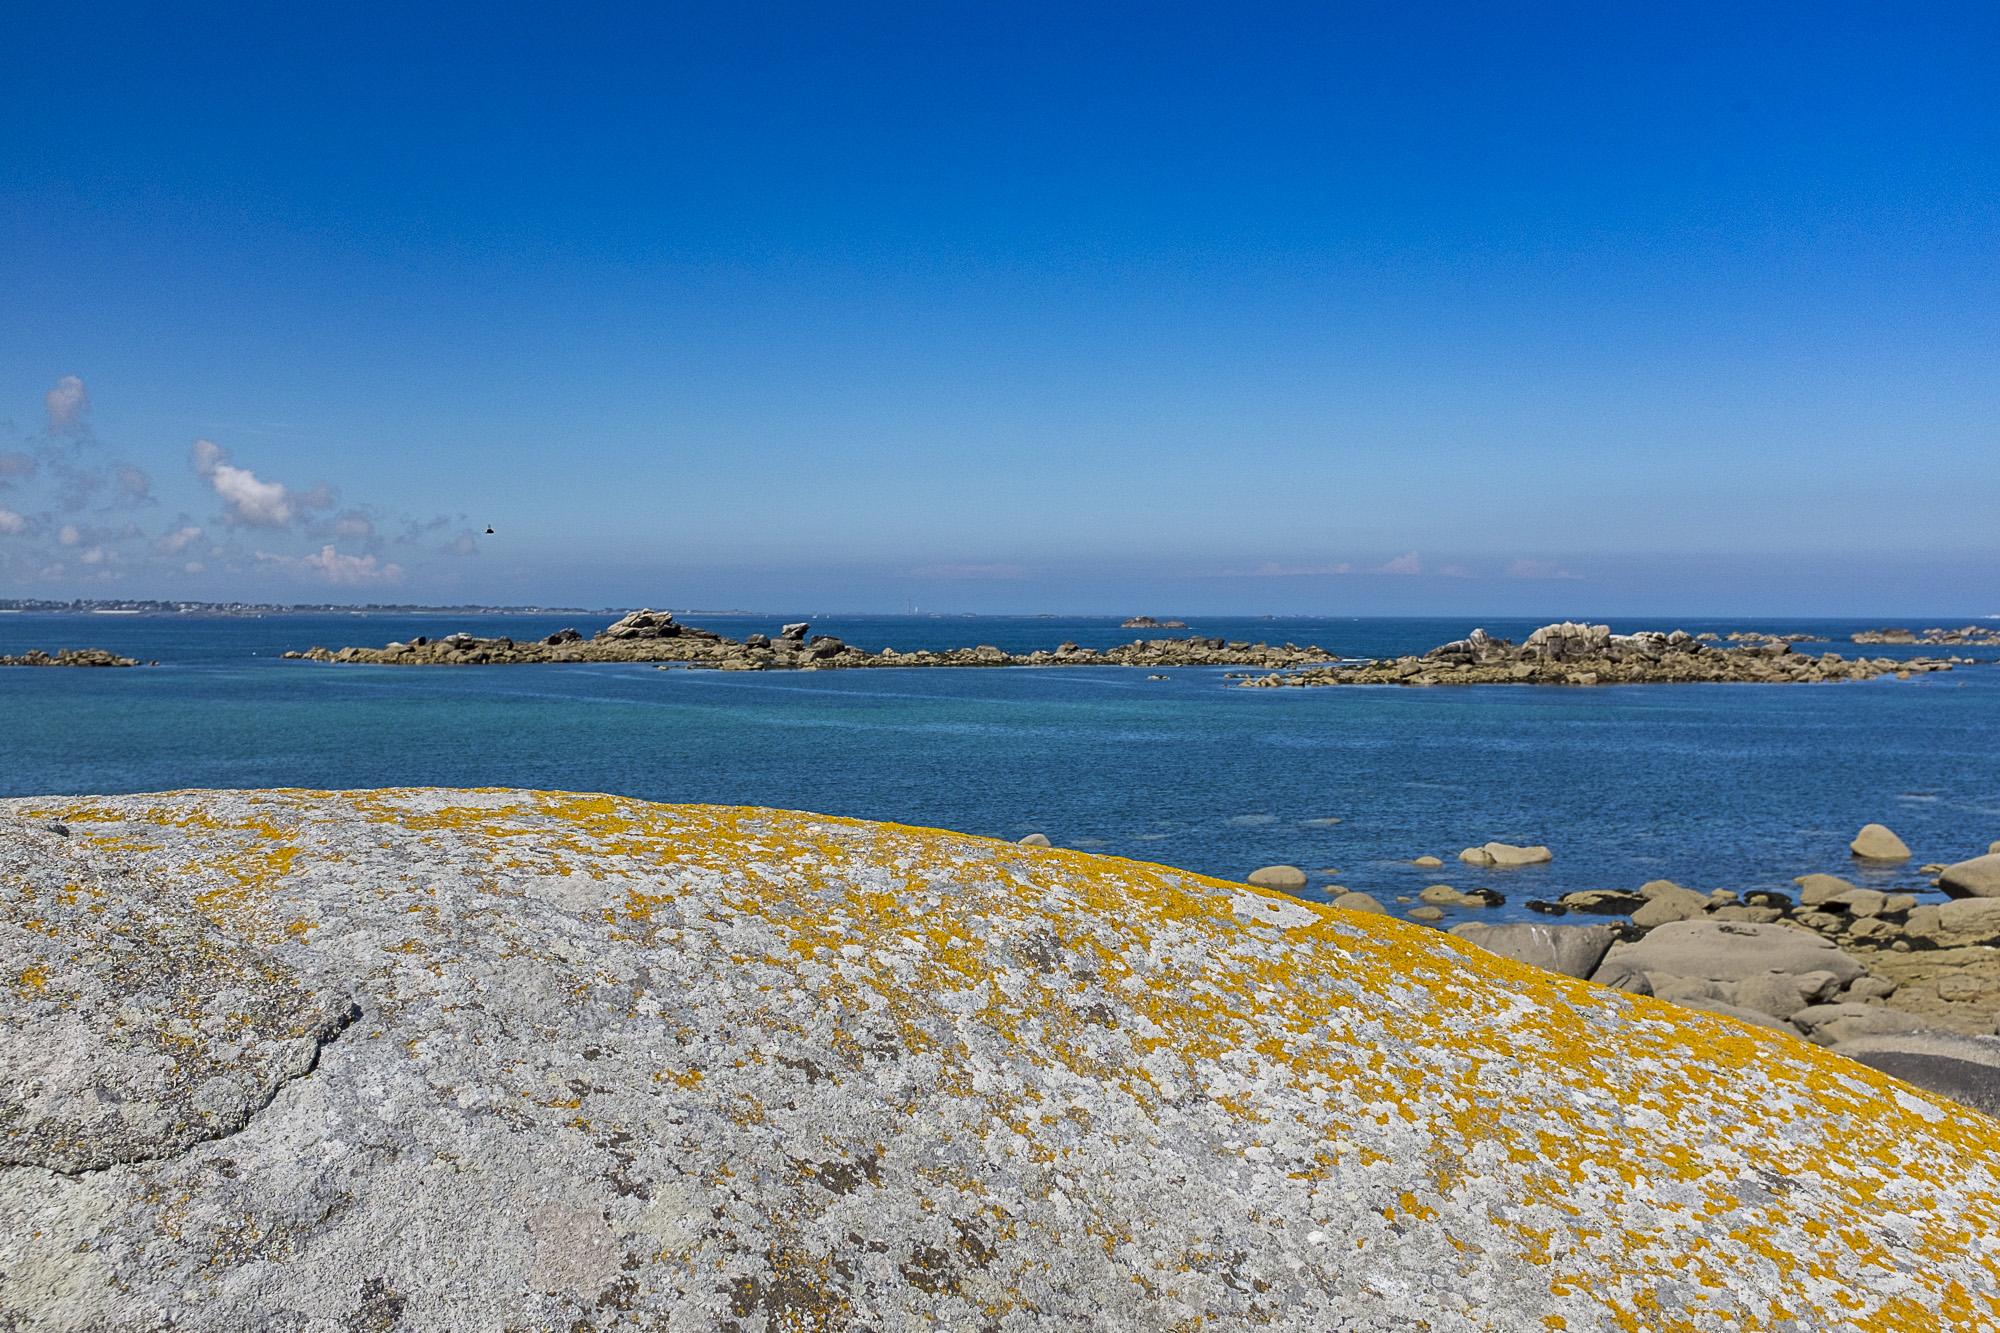 Kerlouan plage de Neiz Vran, chaos granitique